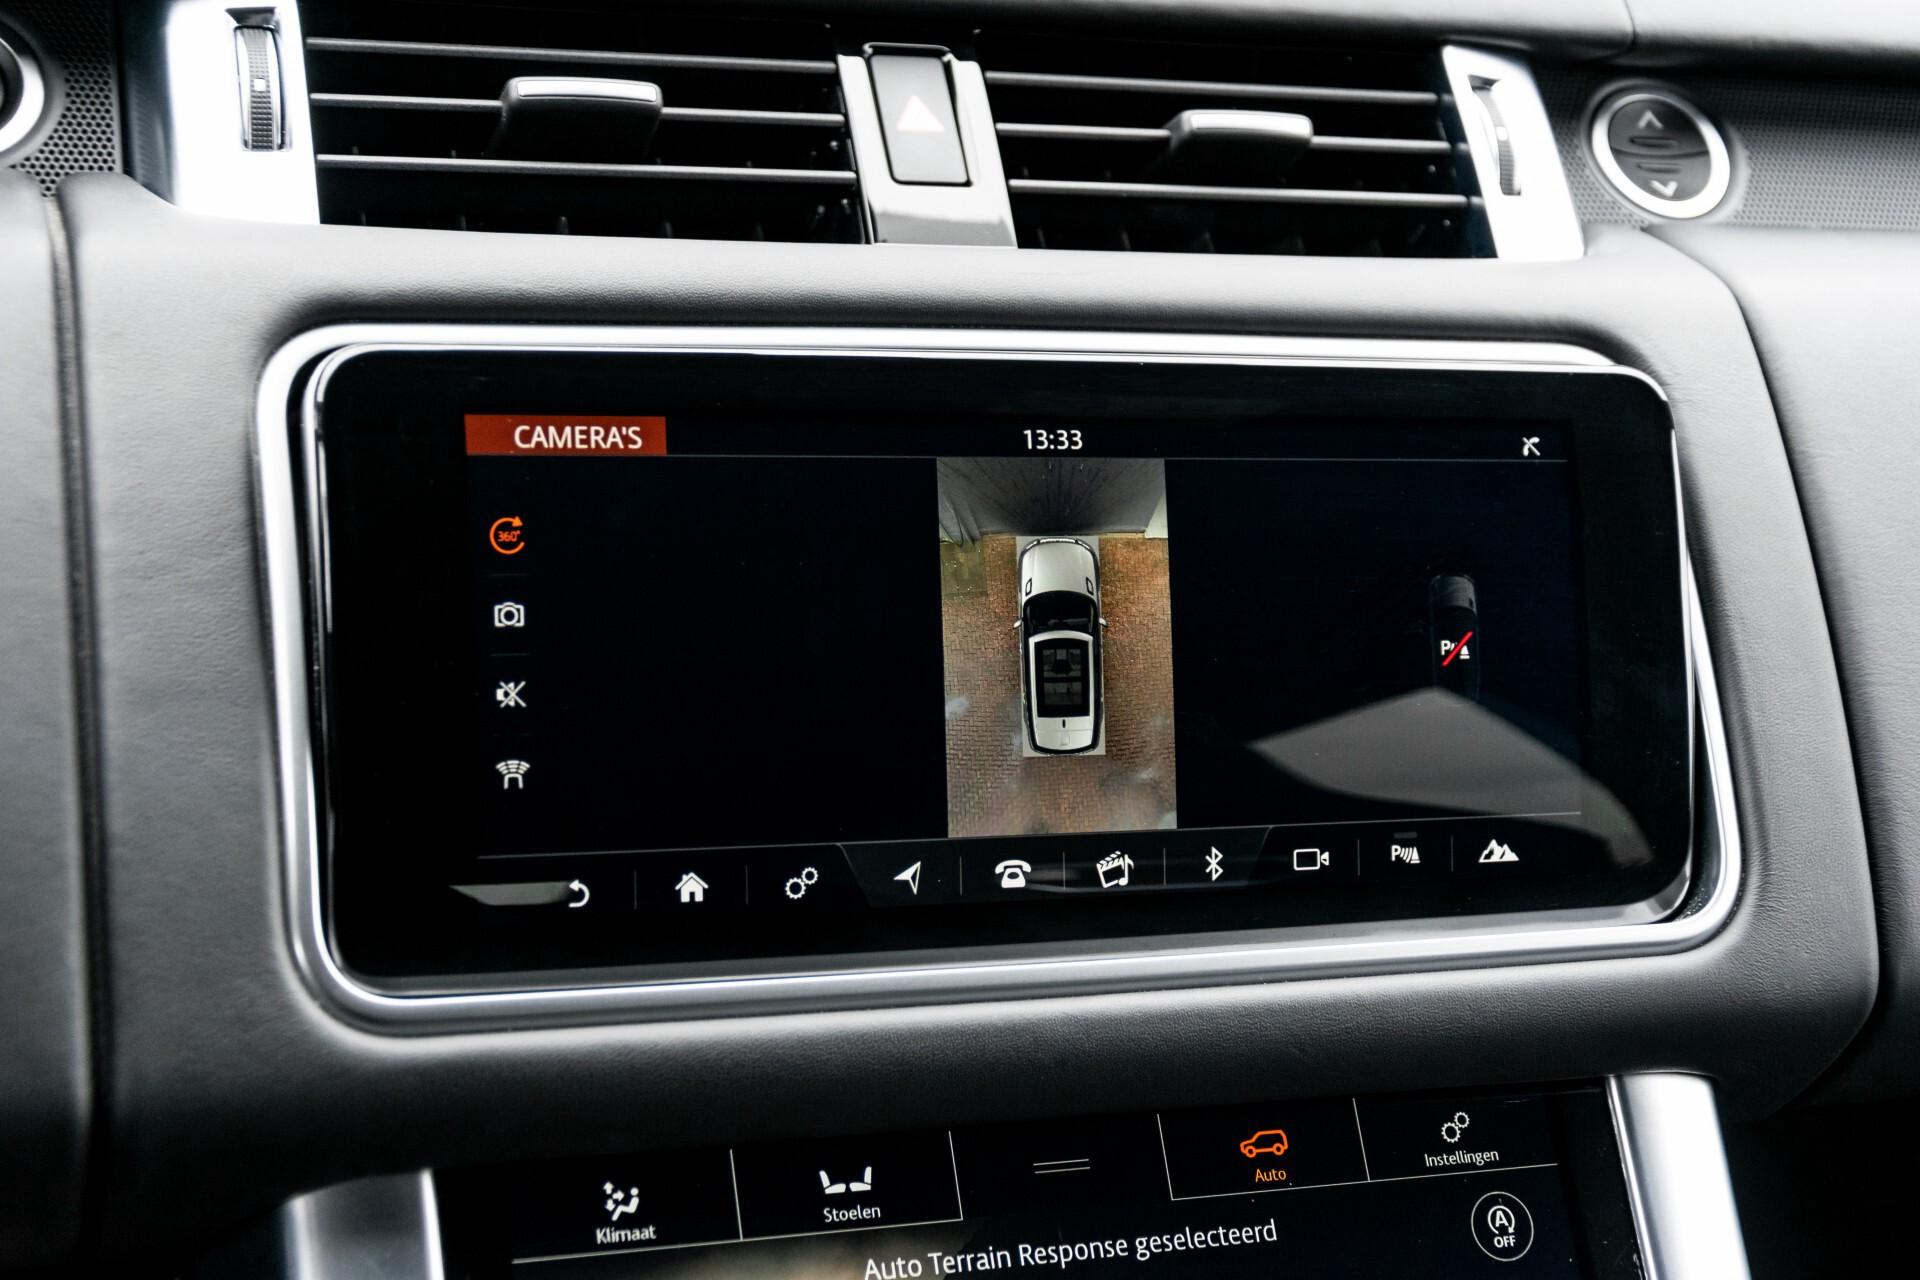 Land Rover Range Rover Sport SVR 5.0 Supercharged 575pk Full Carbon Nieuwprijs €241377 Foto 25